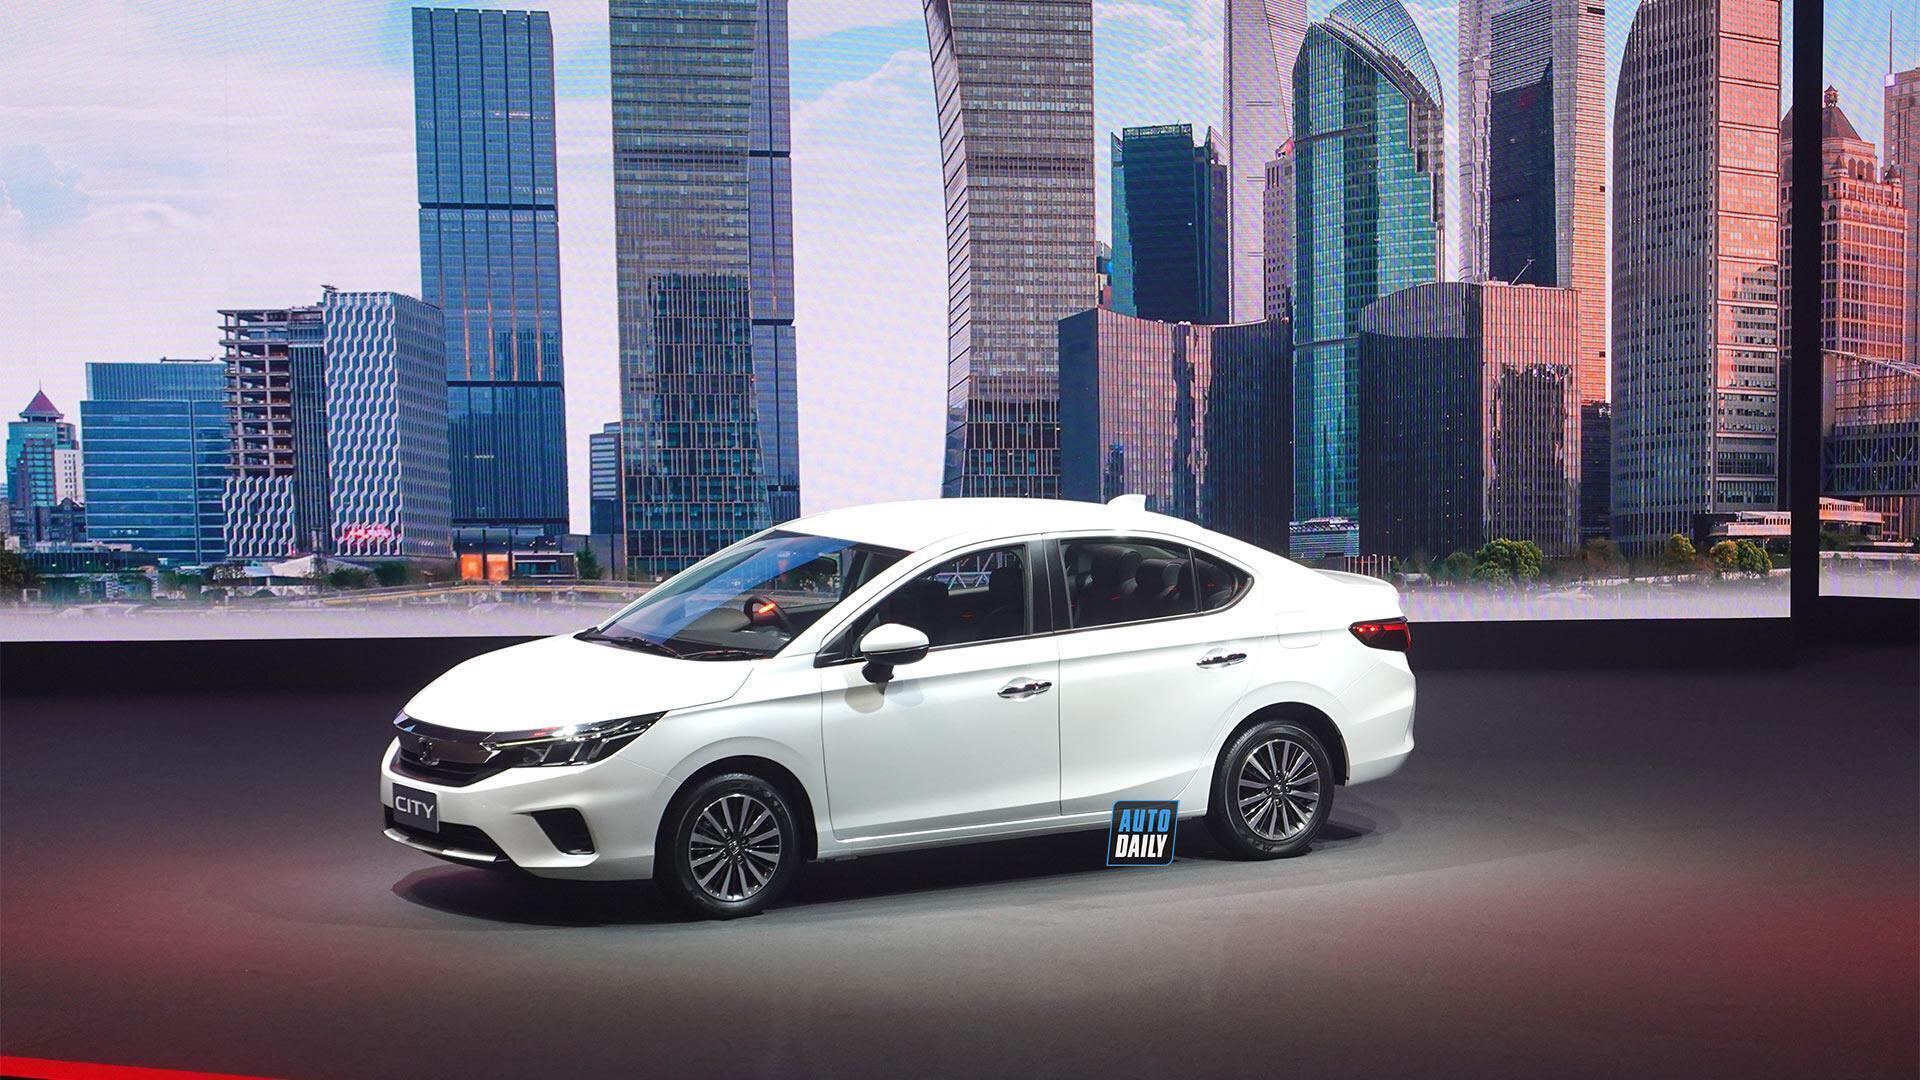 honda-city-2020-autodaily-06.jpg